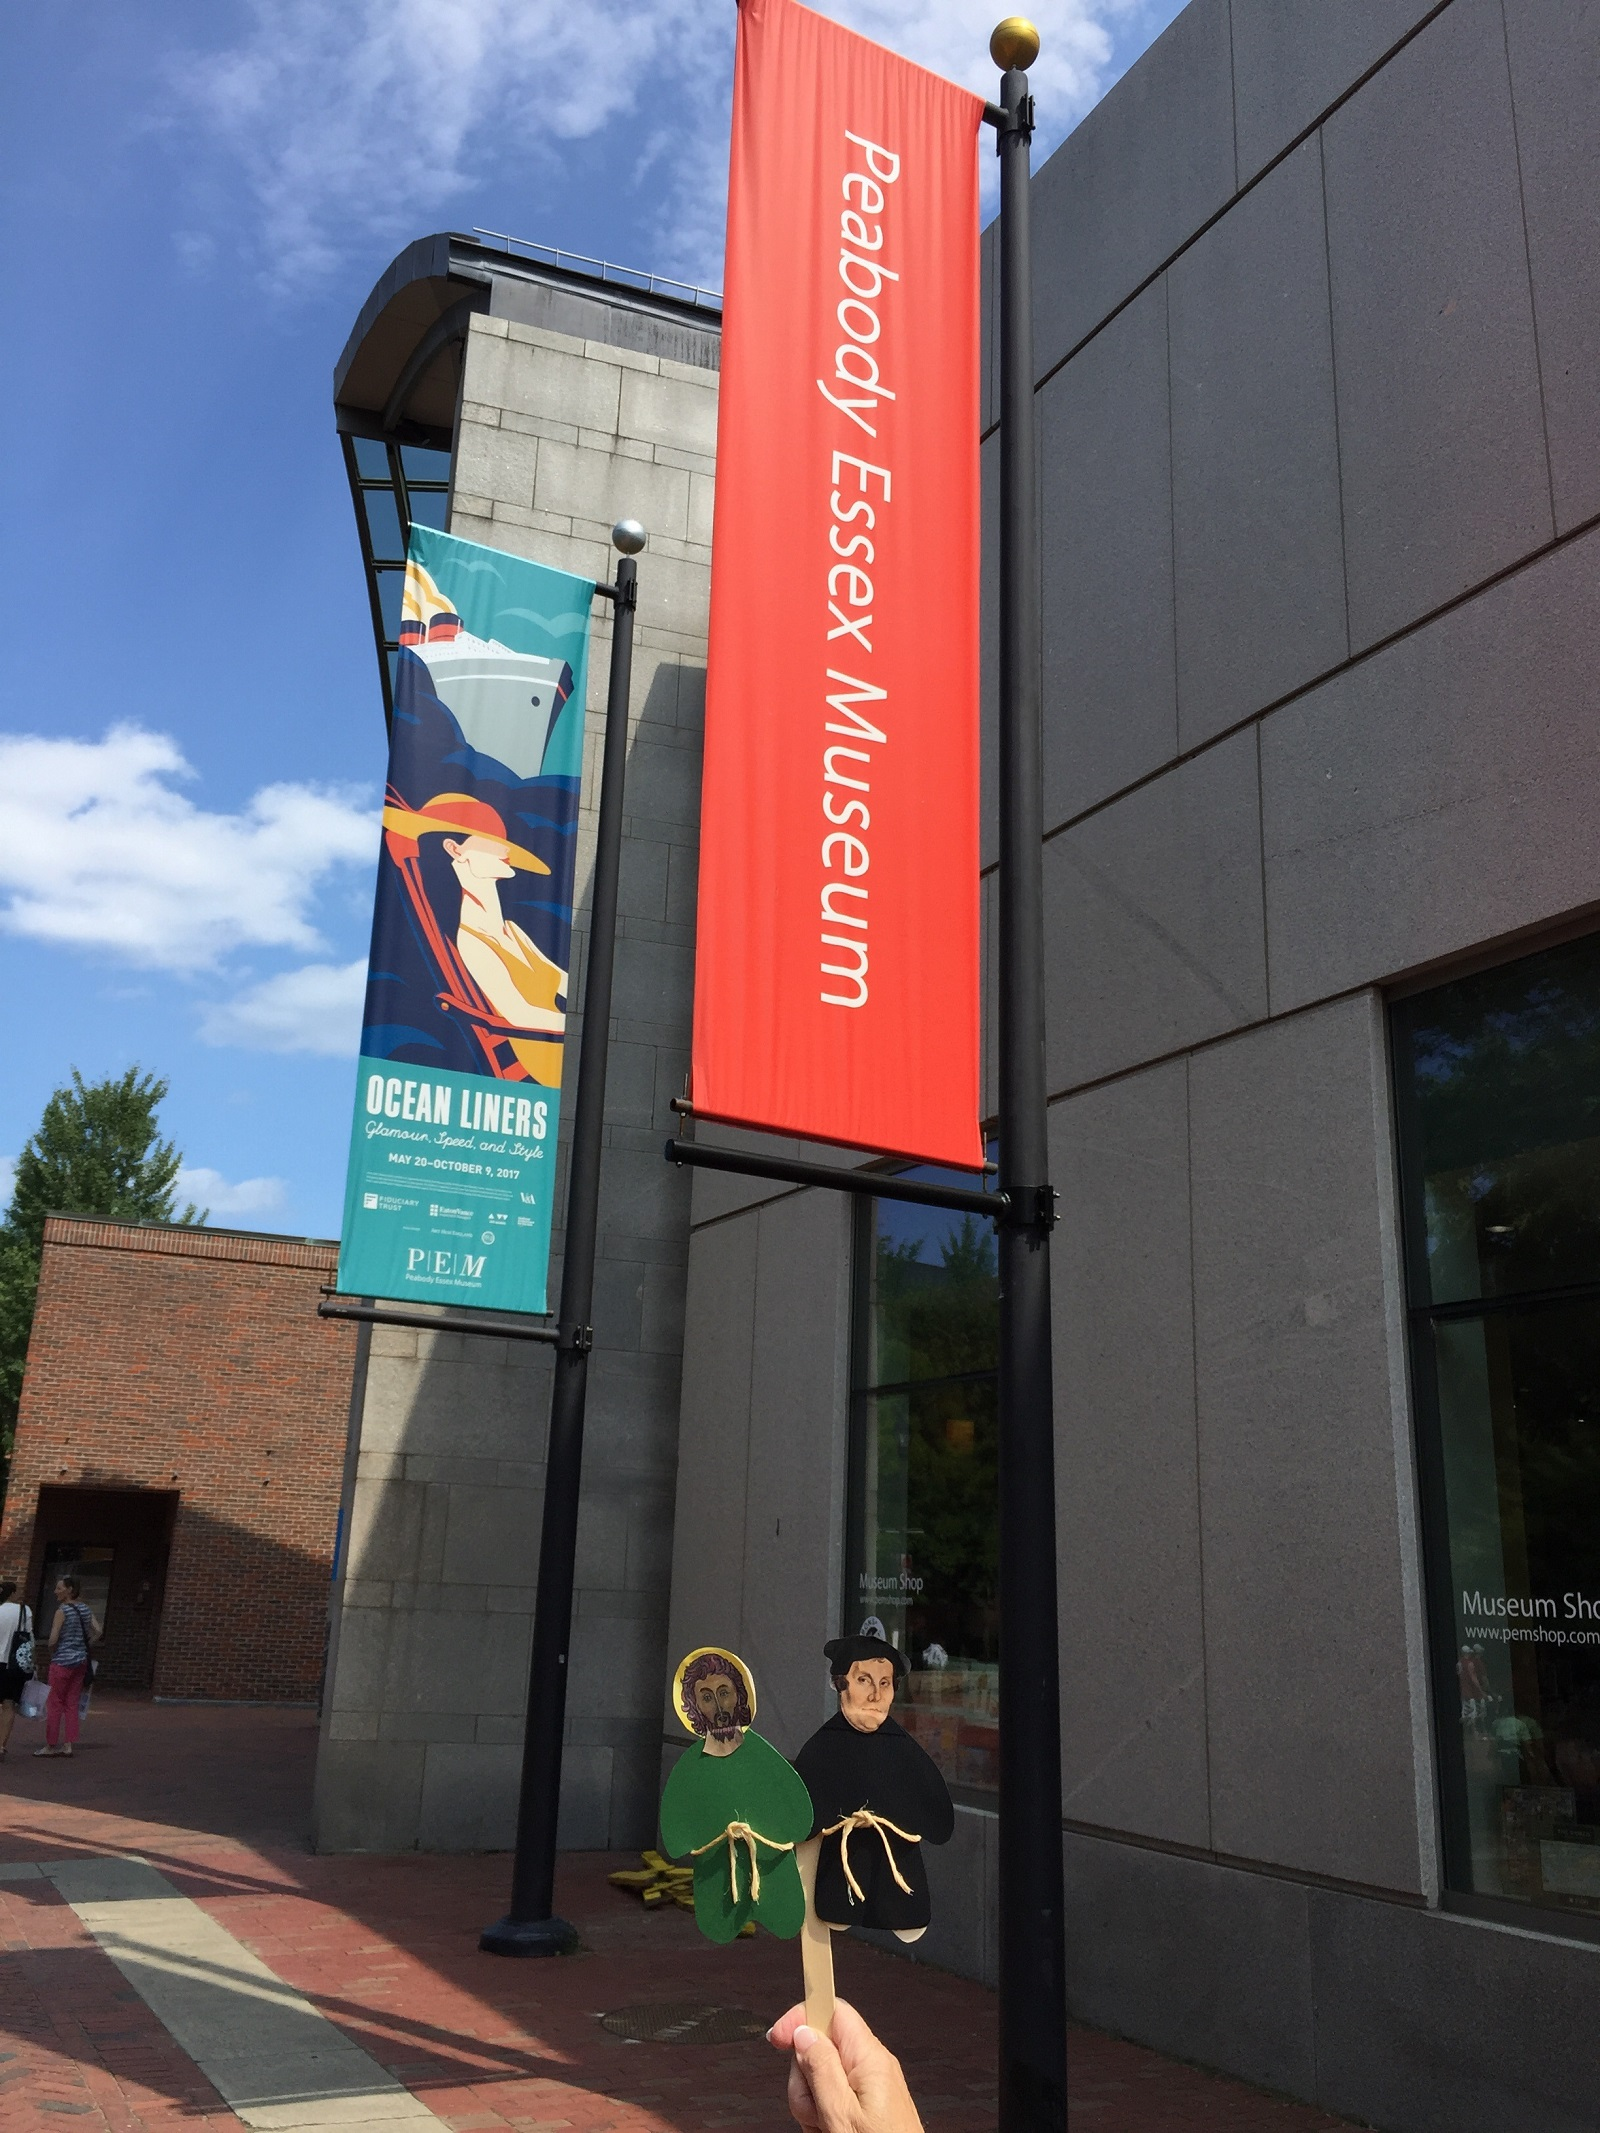 Peabody Essex Museum, Salem, MA, August 2017